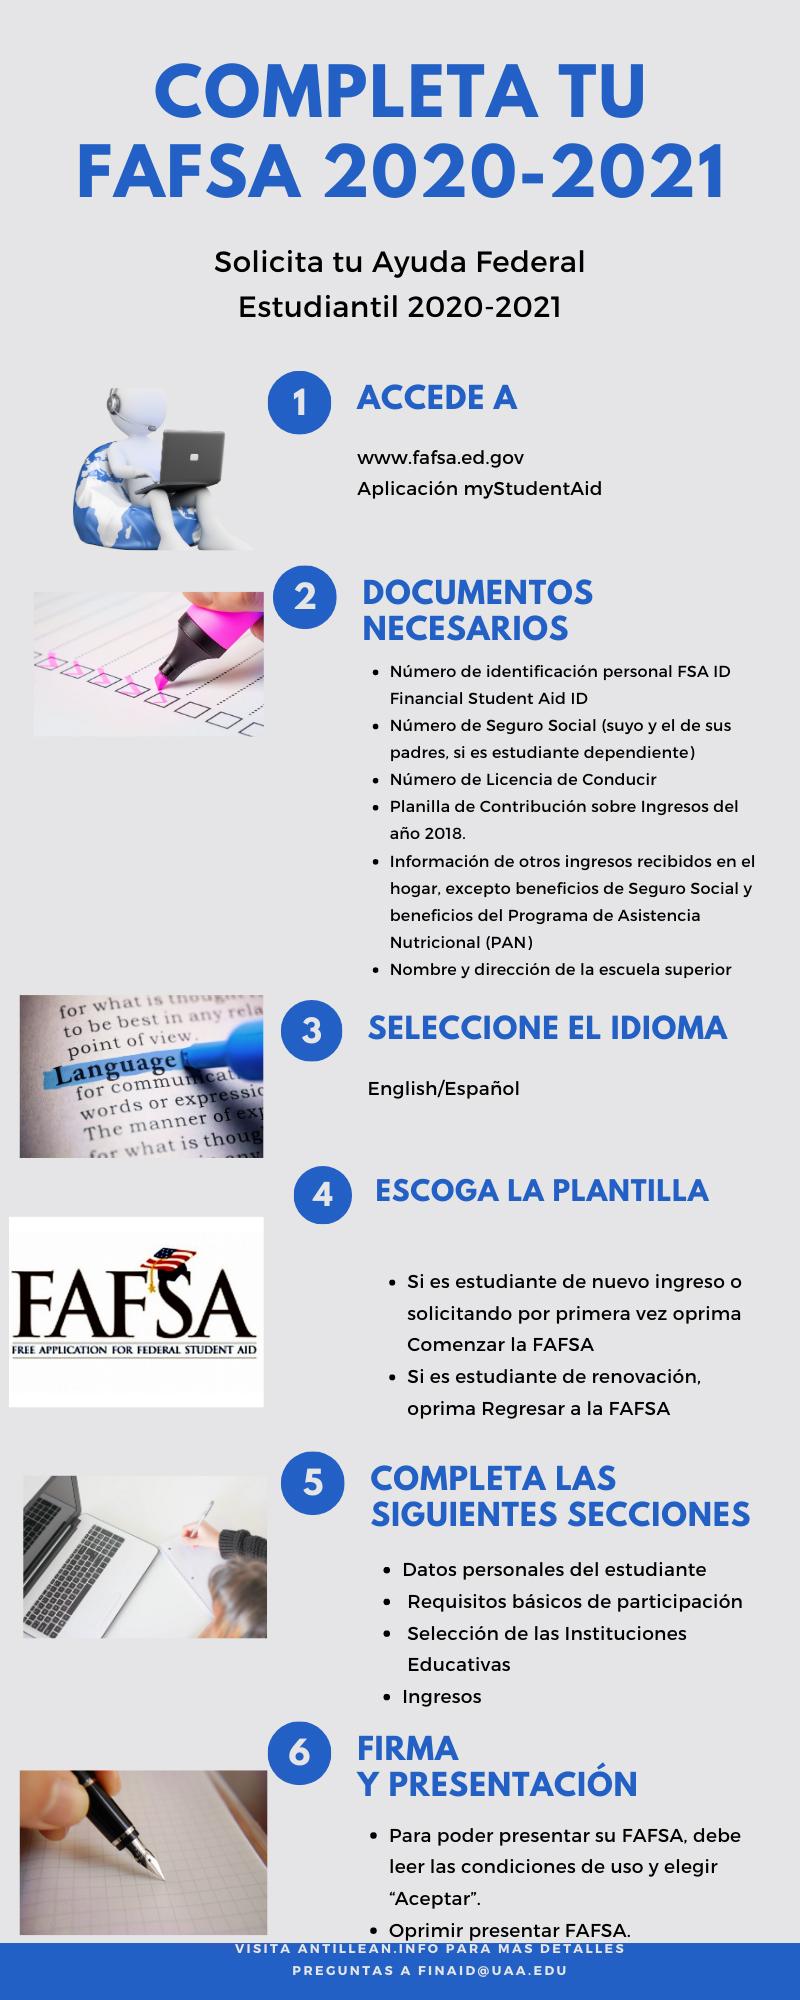 Completa tu FAFSA 2020-2021